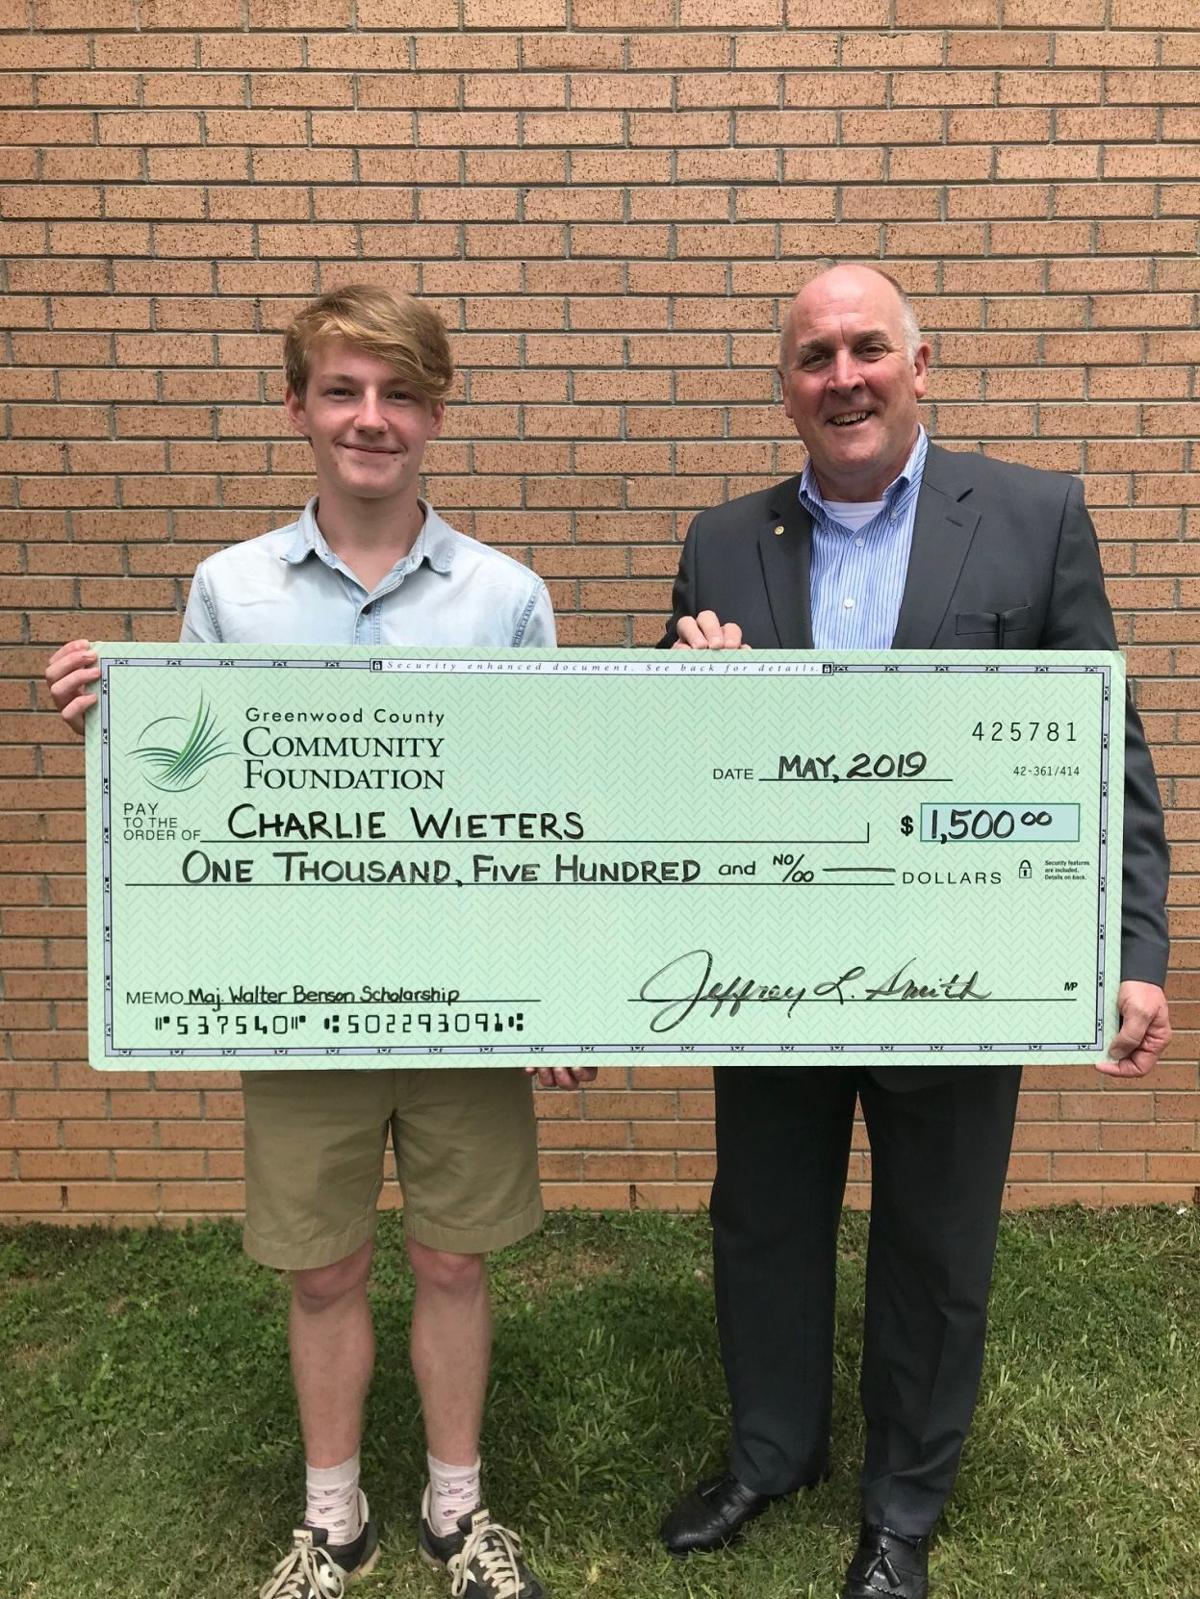 Four Greenwood High School Seniors Receive Major Benson Scholarships